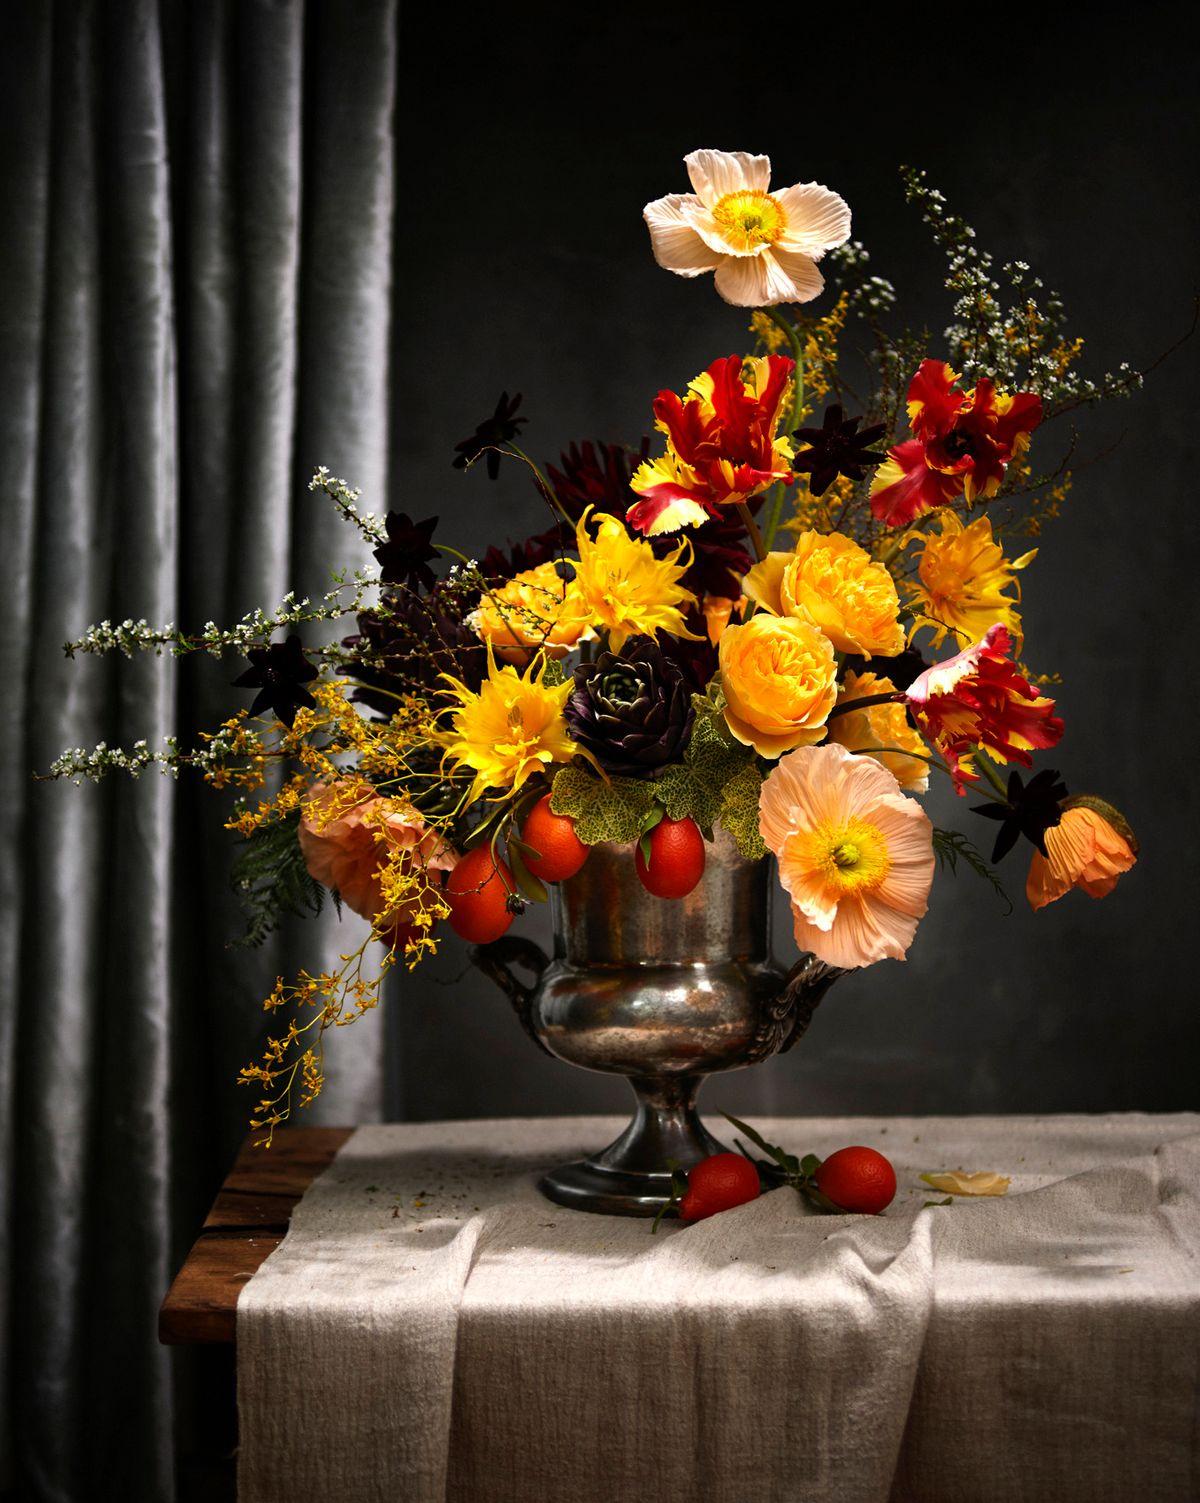 ChristopherWhite_Floral Study_5.jpg